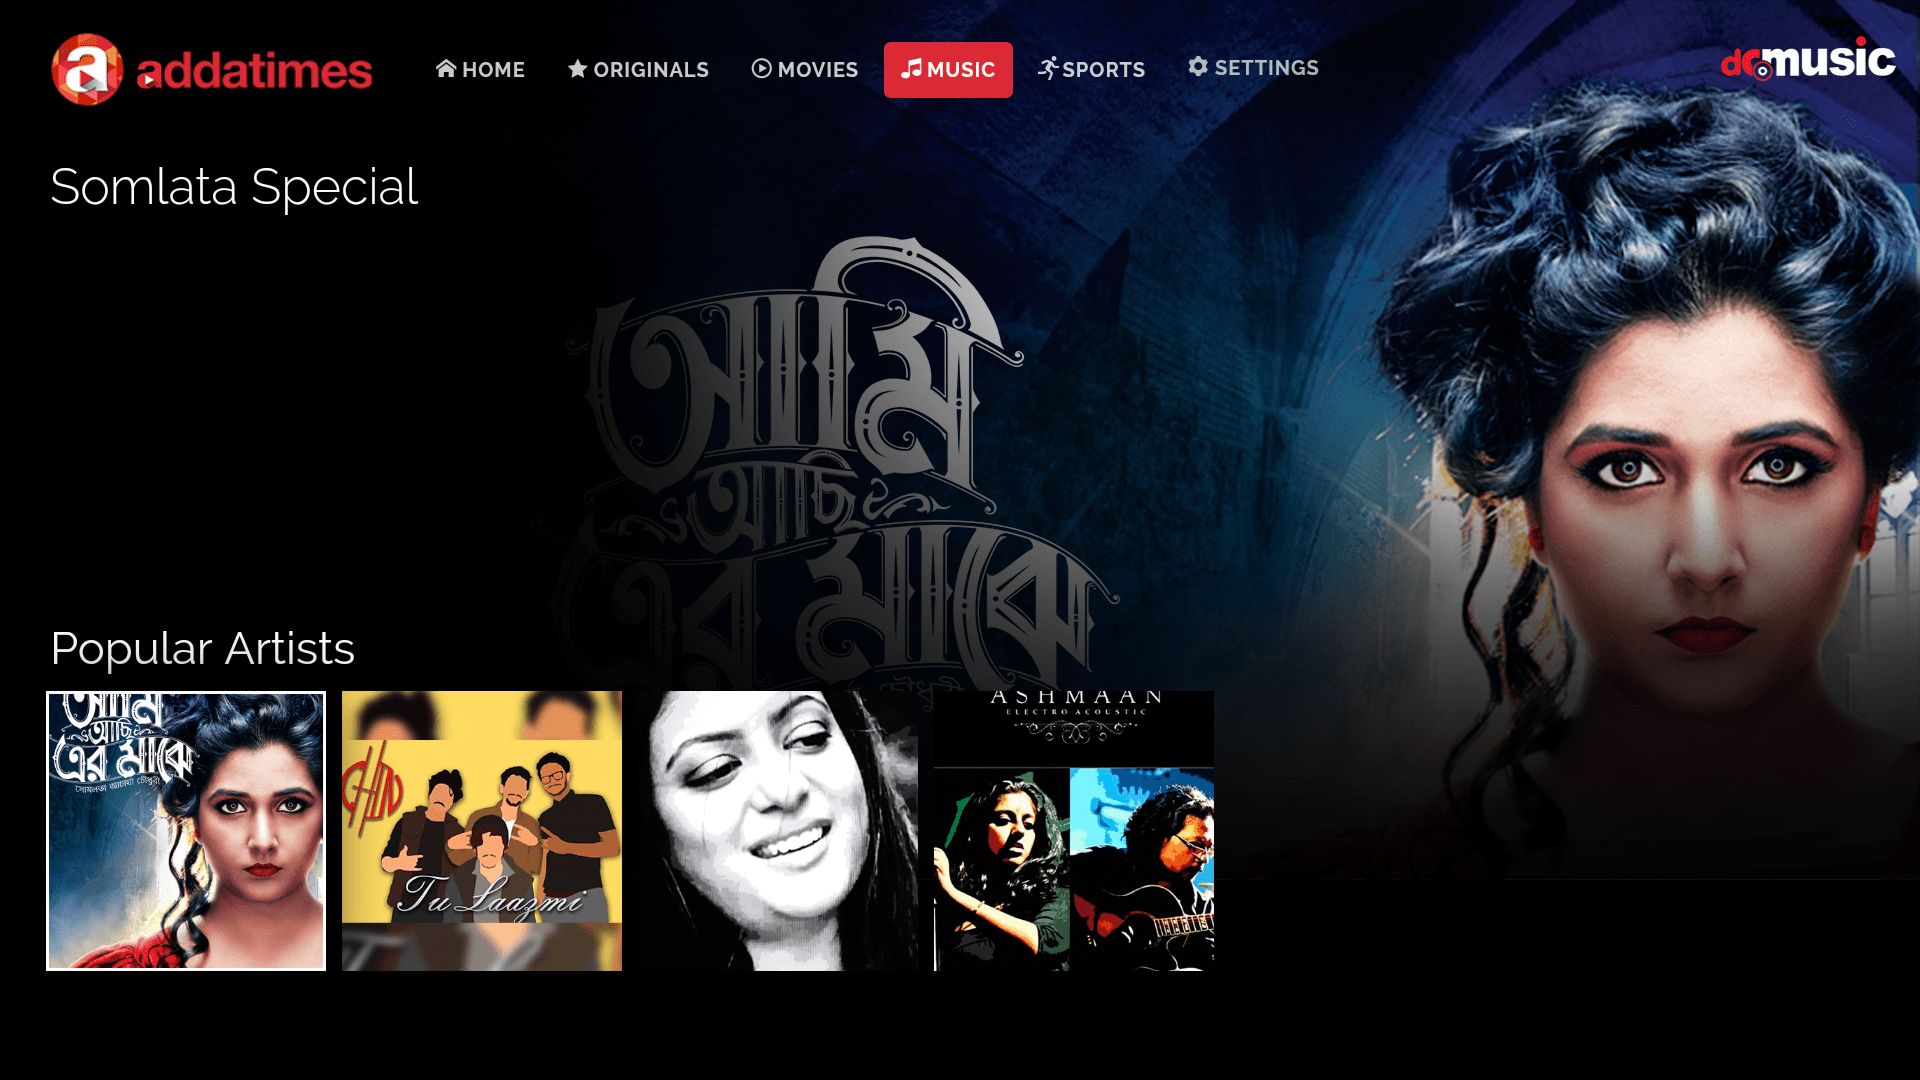 feluda web series theme song download